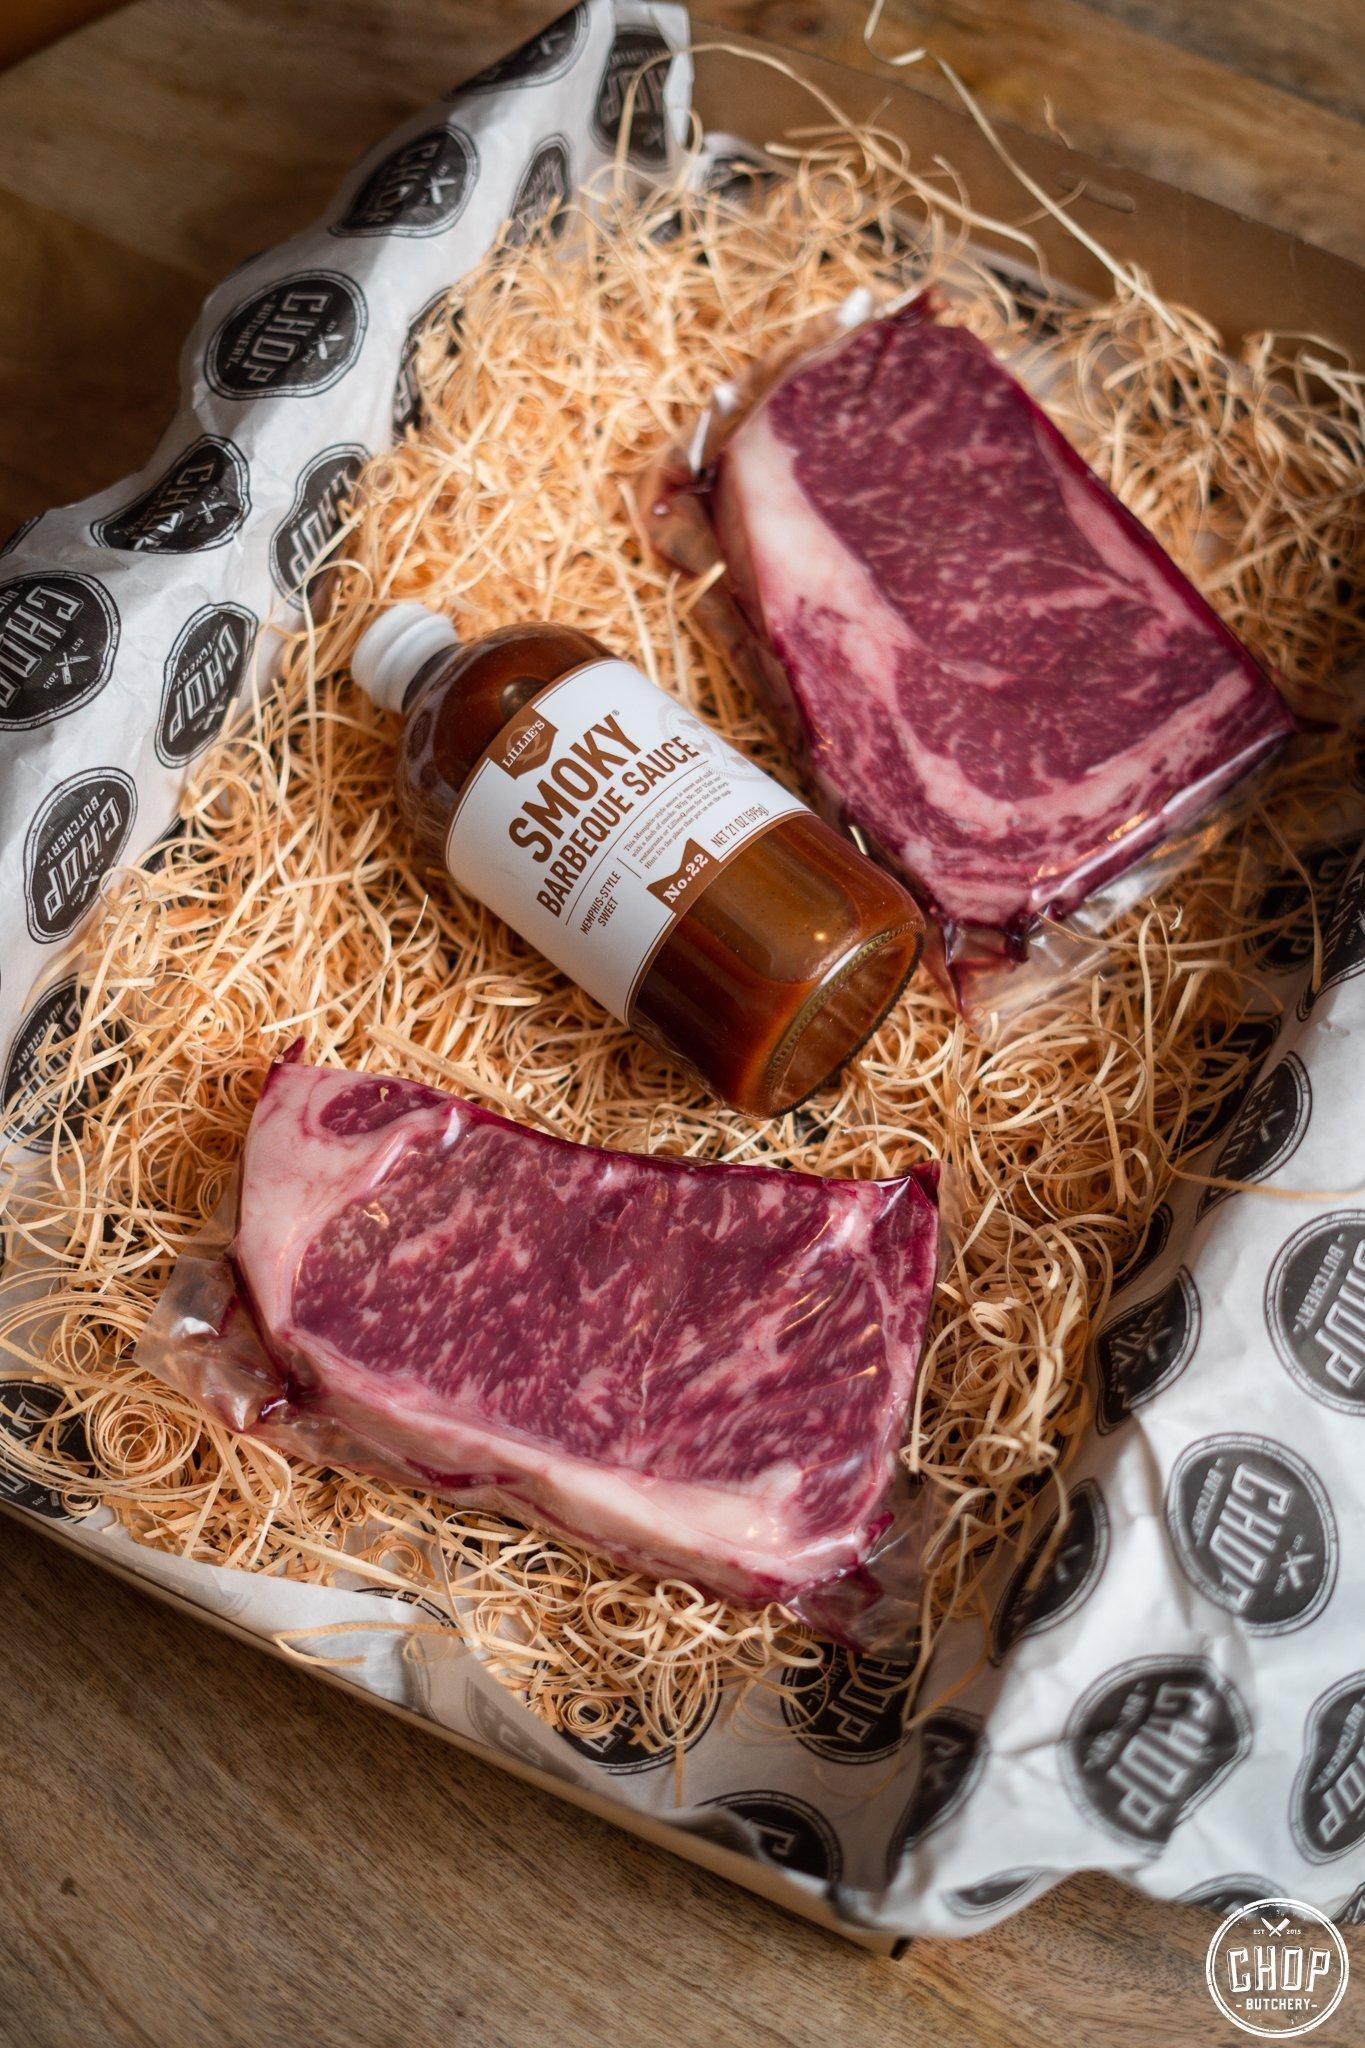 , Chop Packs, Award Winning Butcher Shop | Quality Meat Suppliers Sydney | Chop Butchery